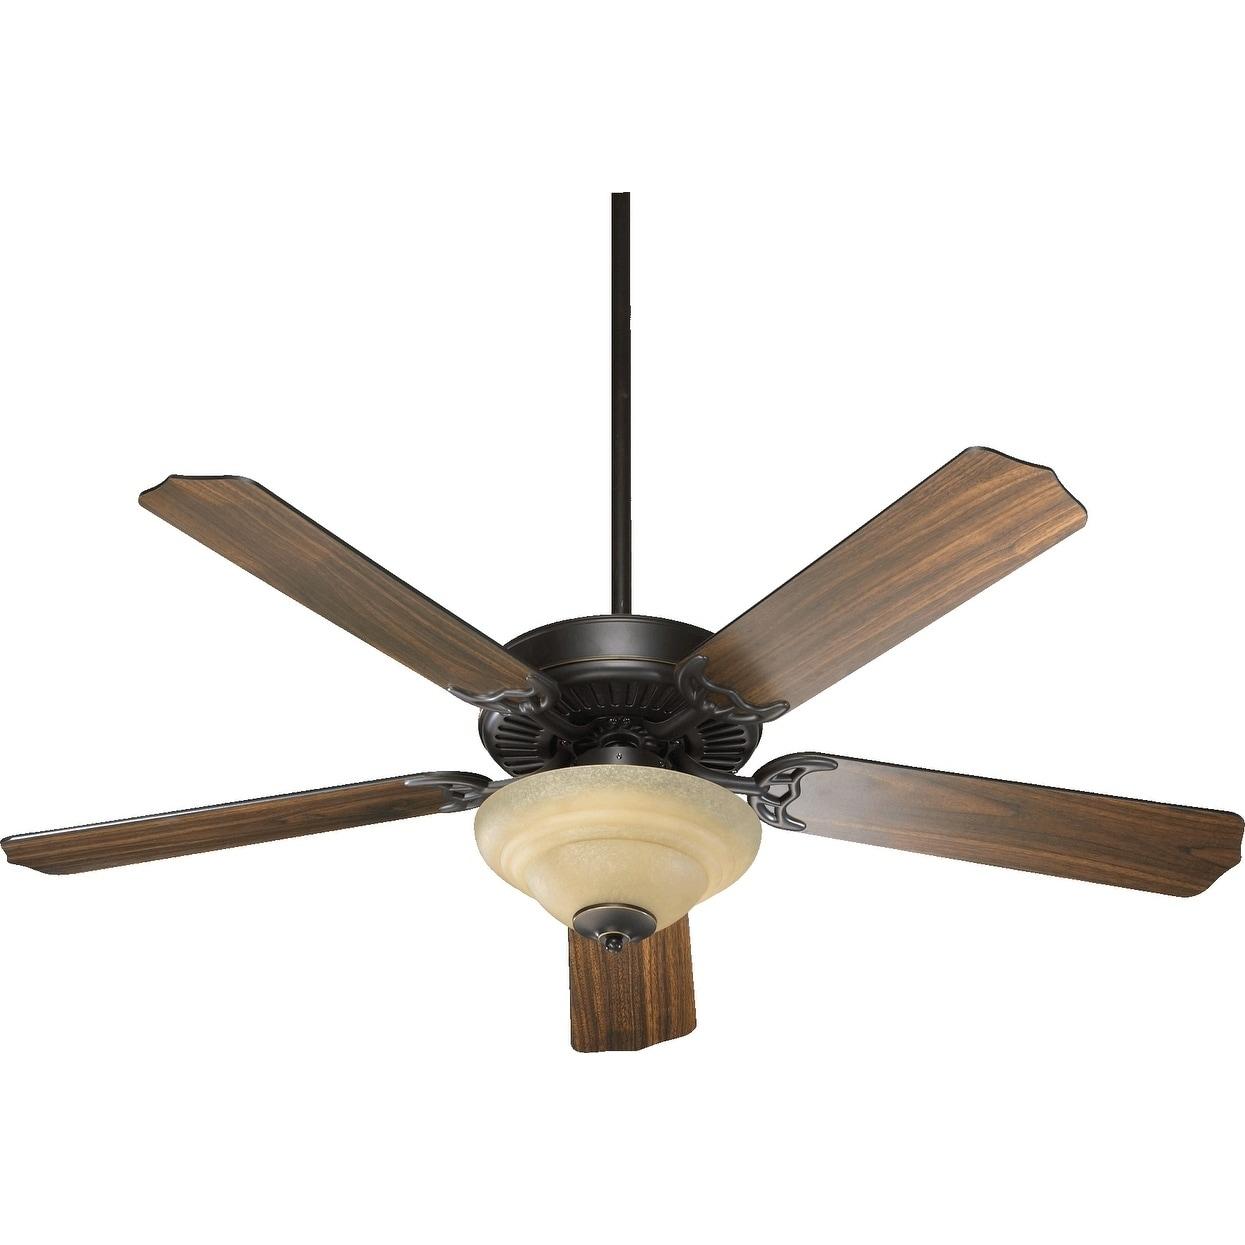 Capri 4 52 traditional ceiling fan with tri bump bowl light kit capri 4 52 traditional ceiling fan with tri bump bowl light kit free shipping today overstock 25193628 aloadofball Choice Image